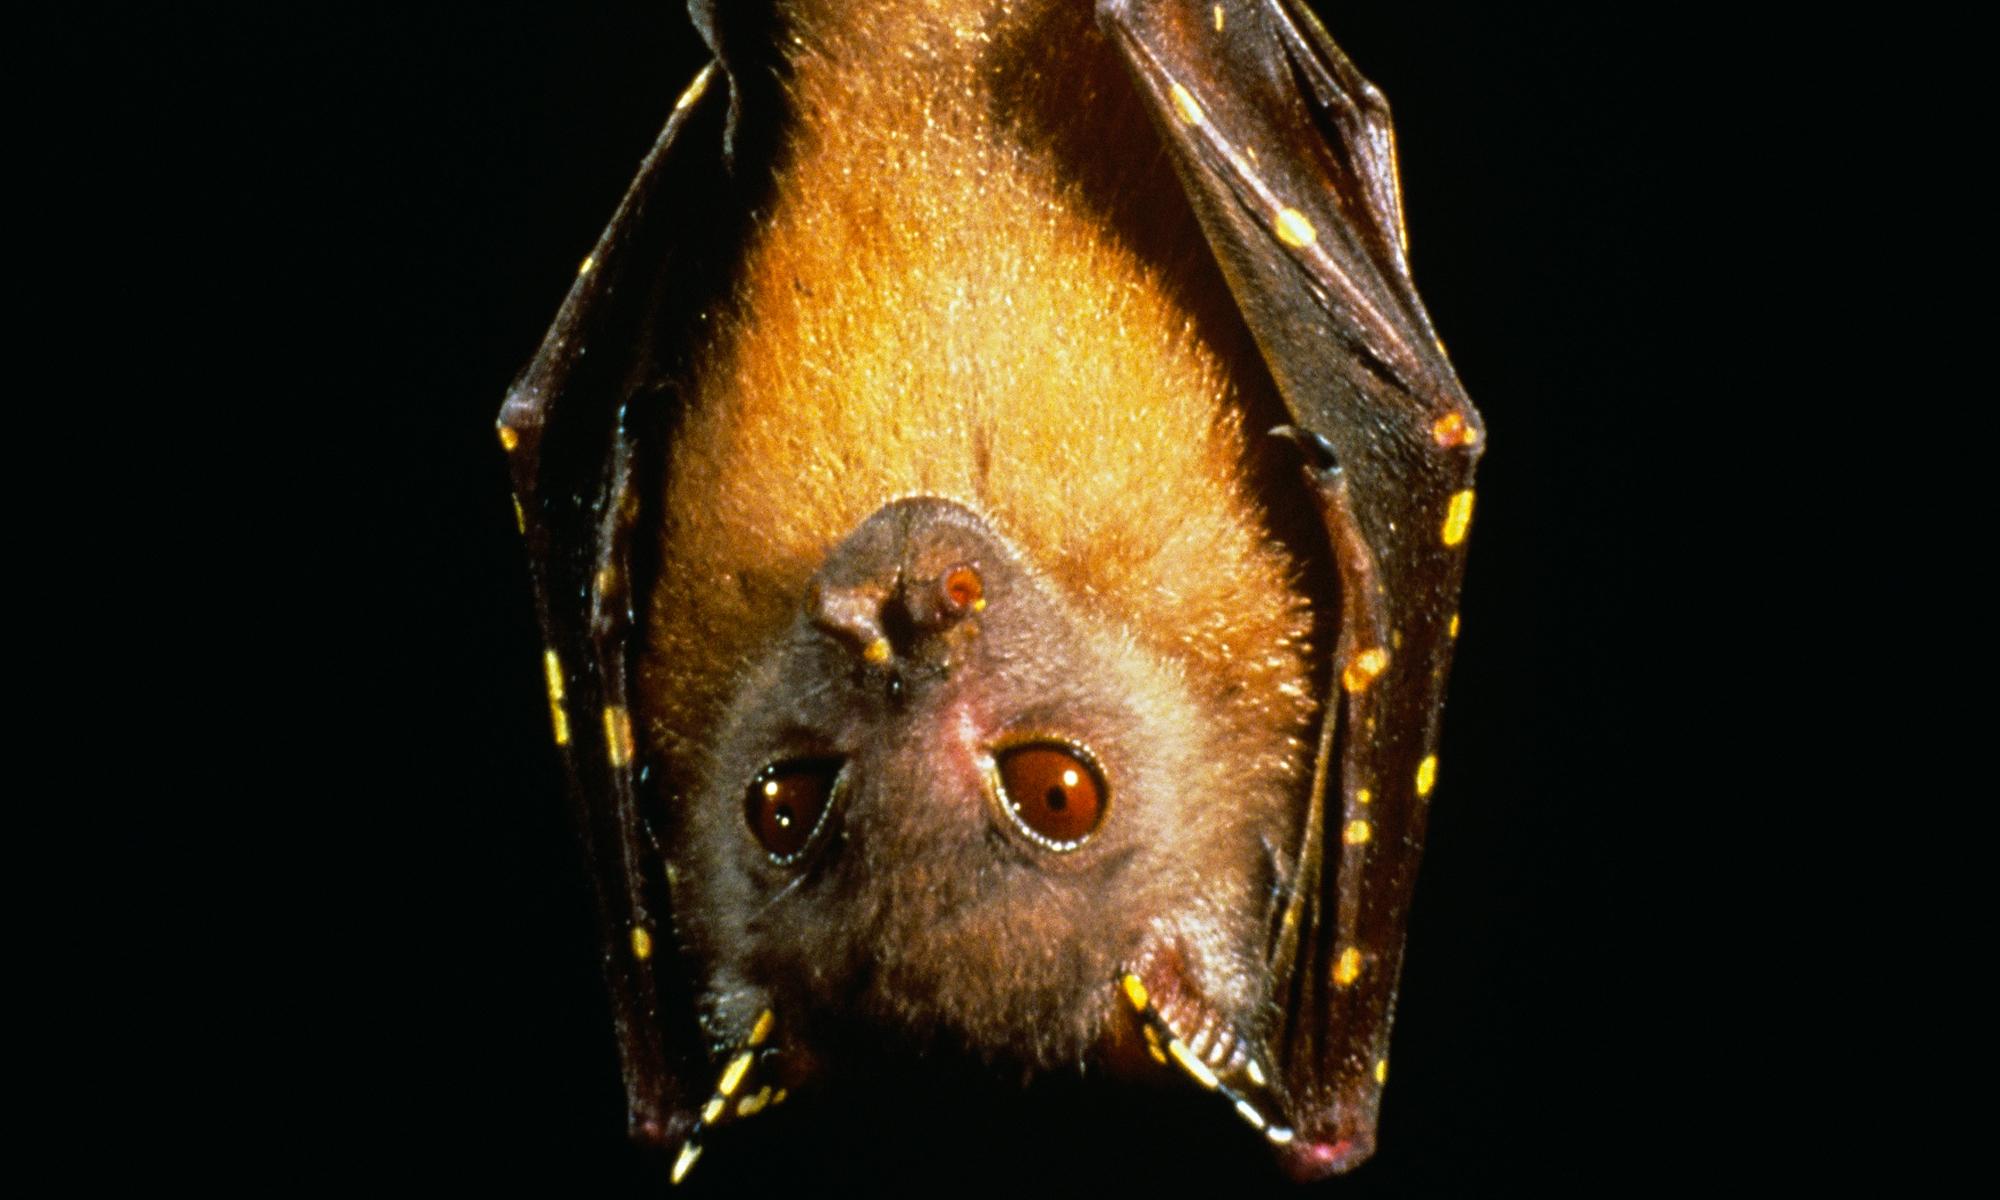 Queensland Tube-Nosed Fruit Bat